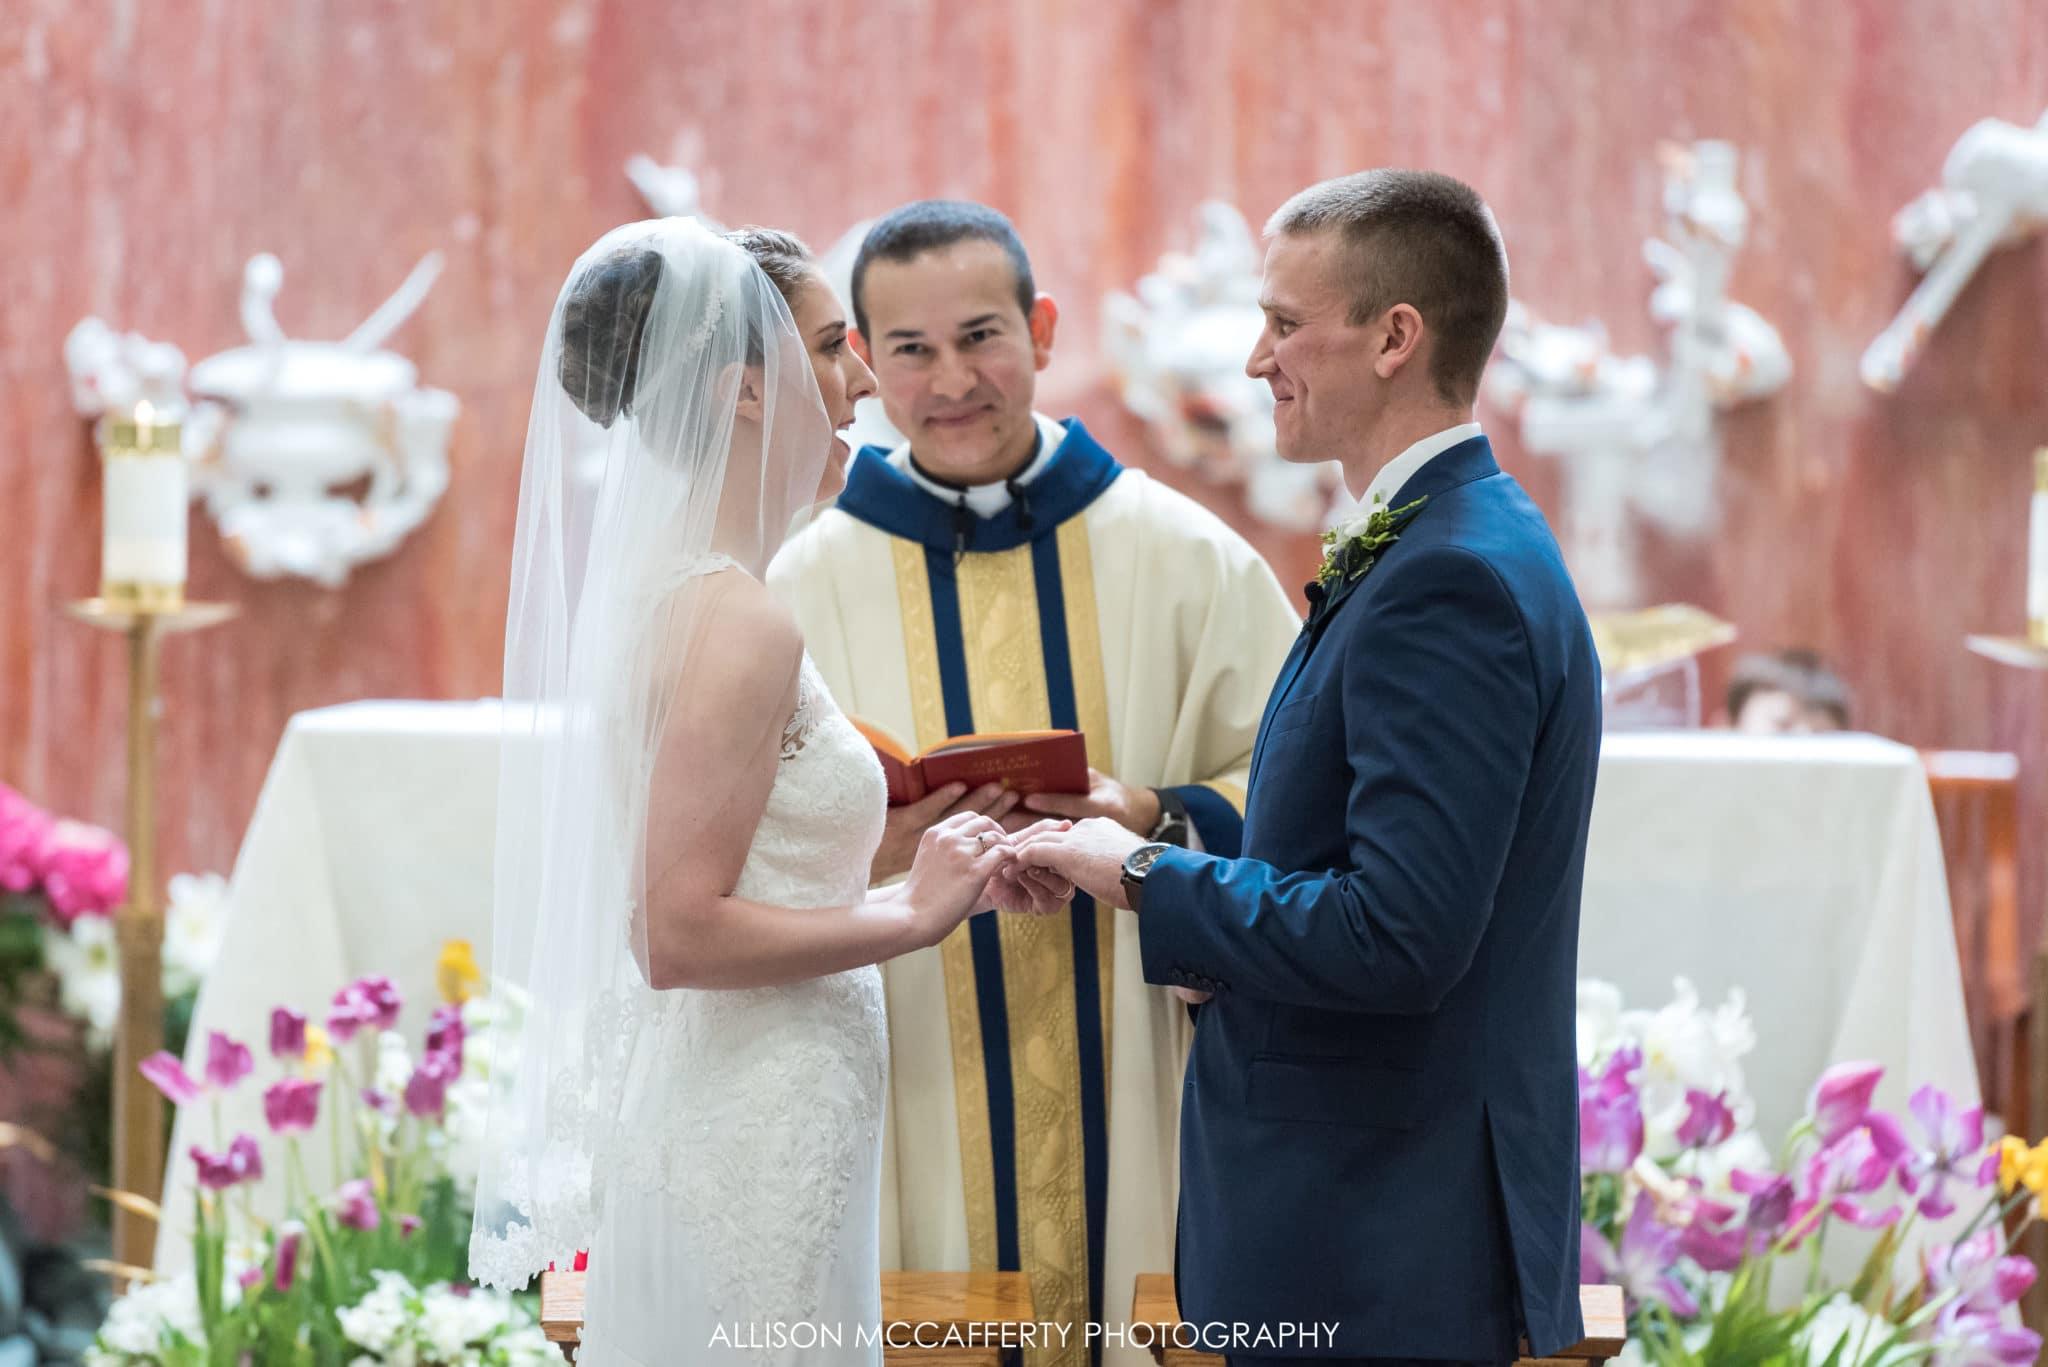 Bride and groom exchanging wedding vows in Berlin NJ